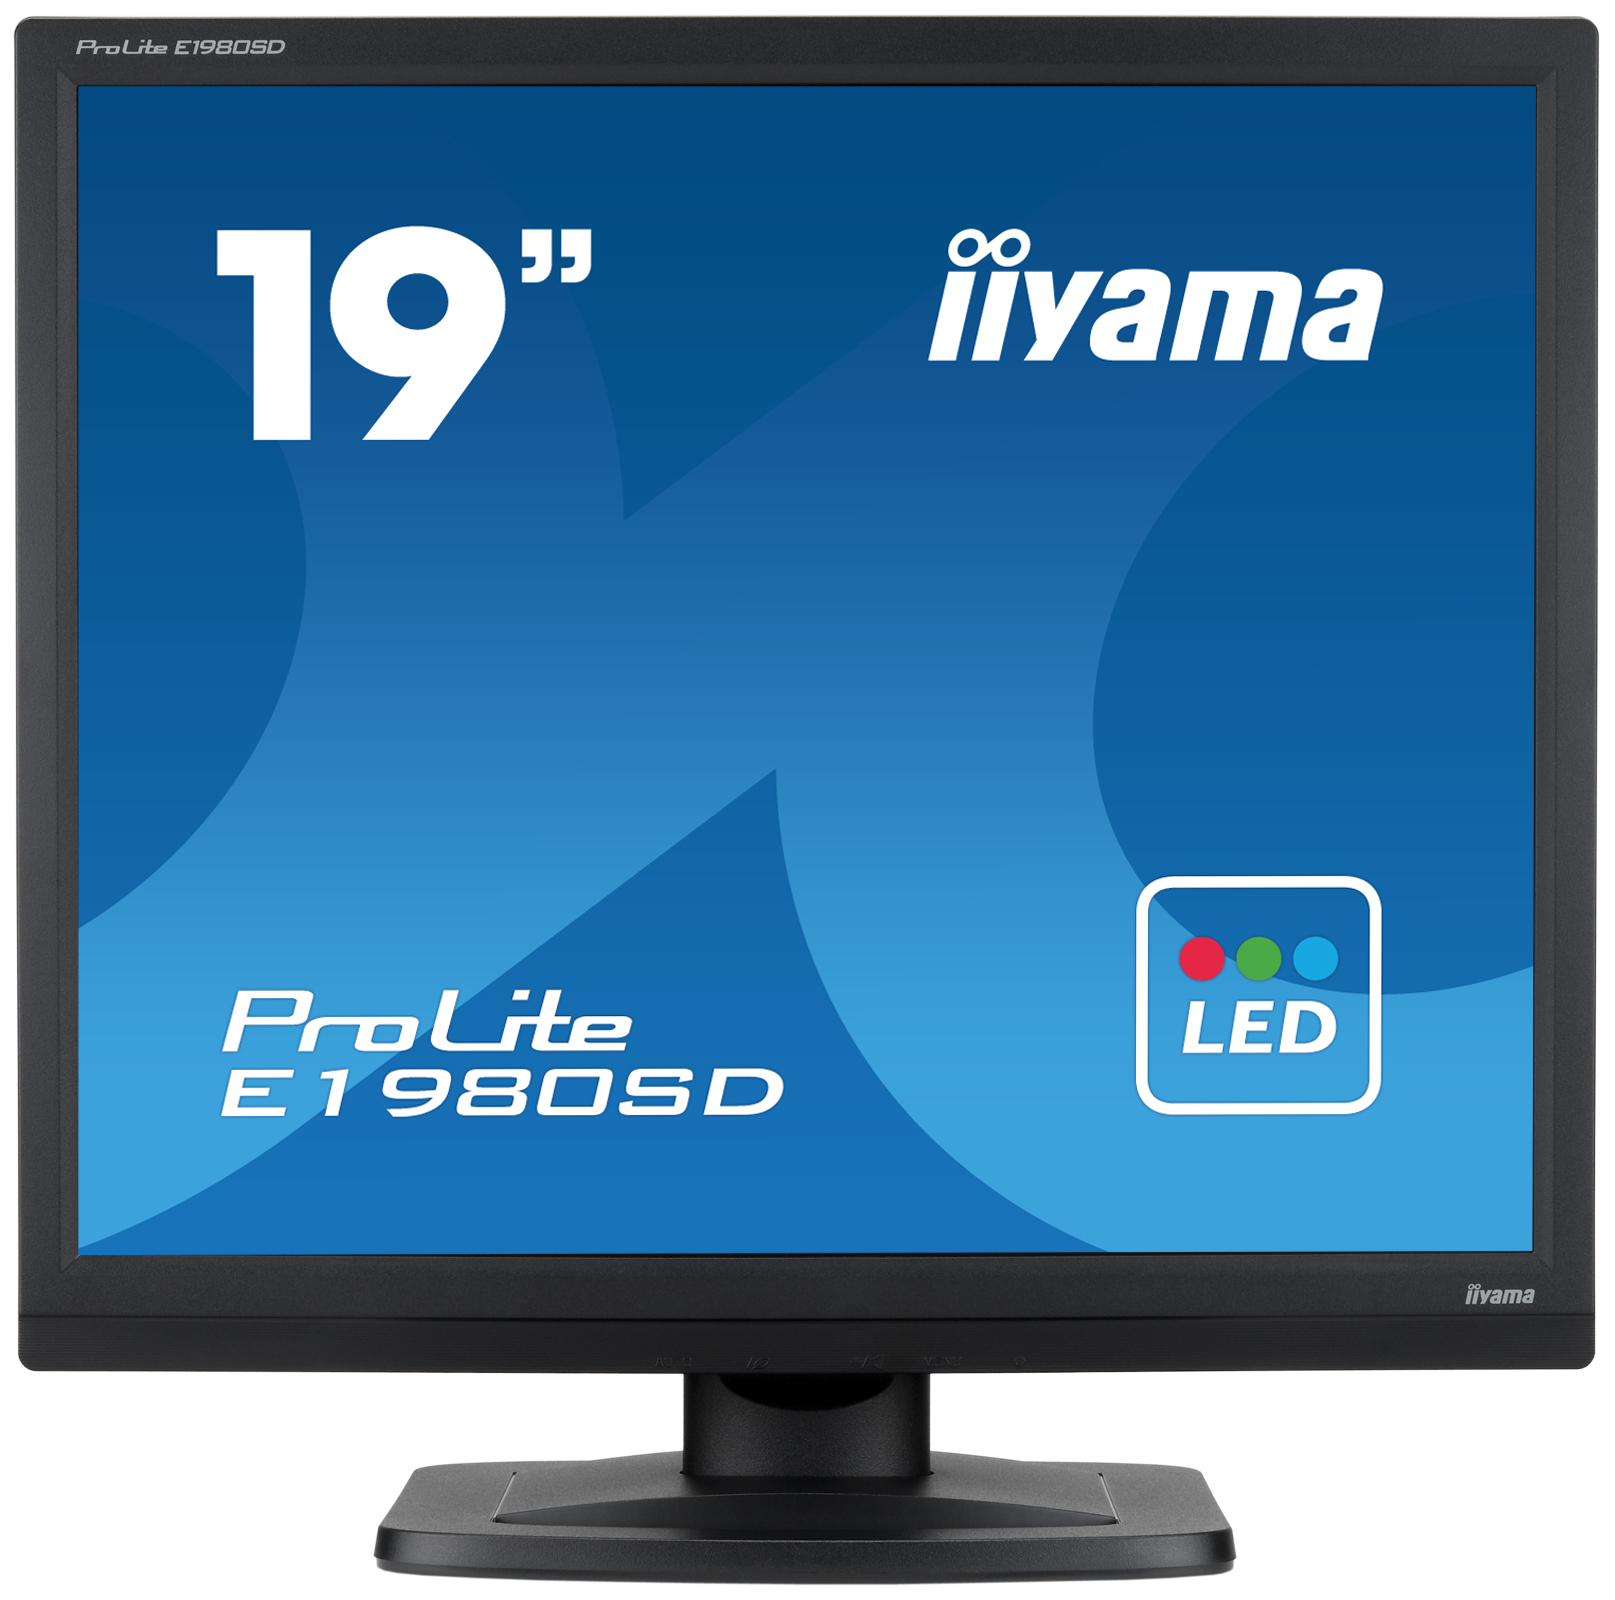 Iiyama ProLite E1980SD - 48,3 cm (19 Zoll) - 1280 x 1024 Pixel - SXGA - LED - 5 ms - Schwarz